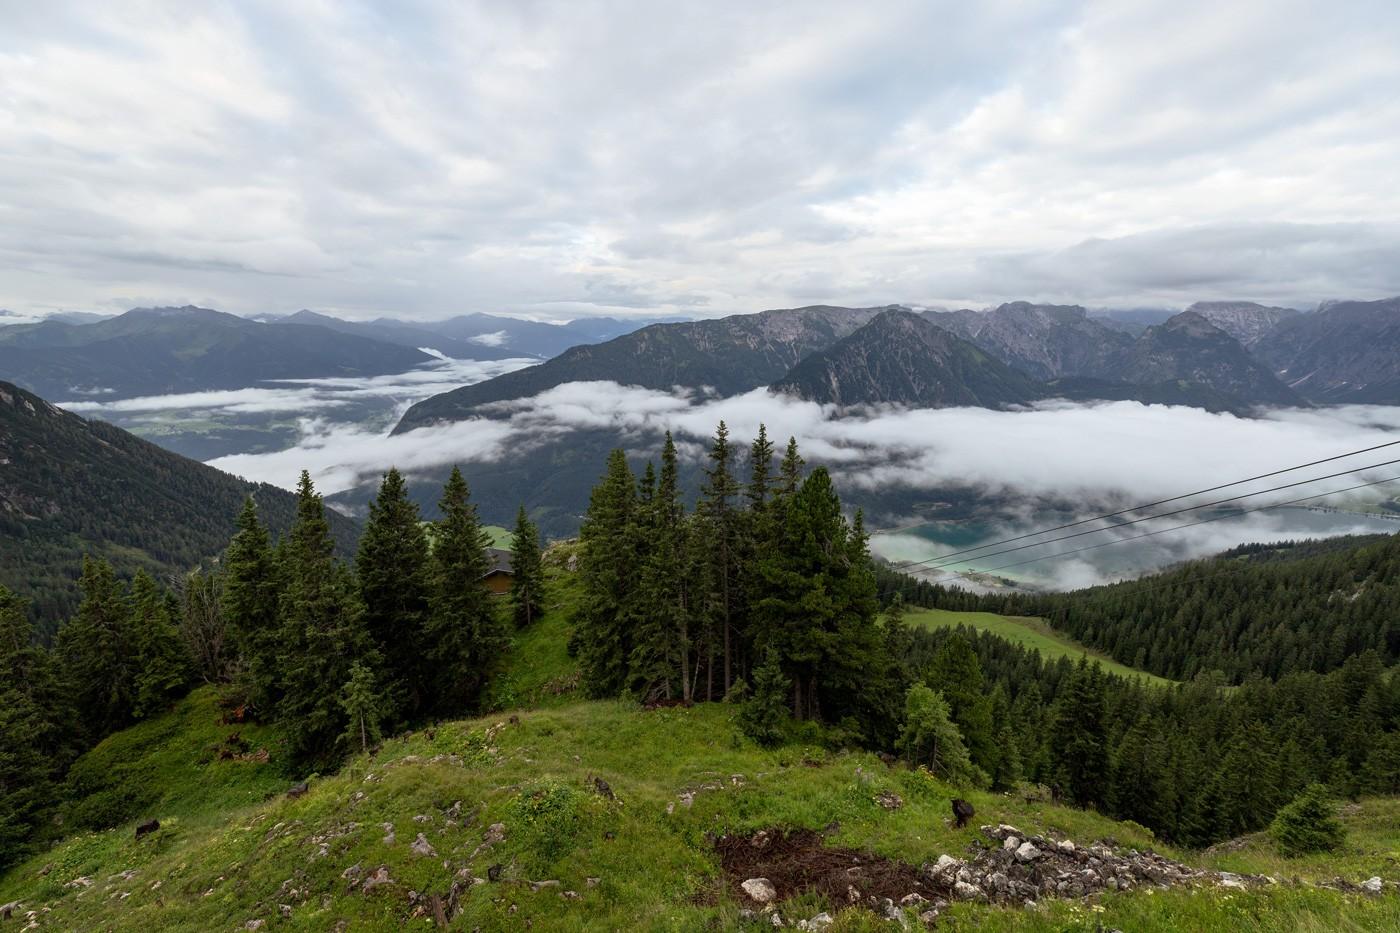 Wanderung Rofanspitze Ausblick Karwendelgebirge Zillertaler Alpen Achensee